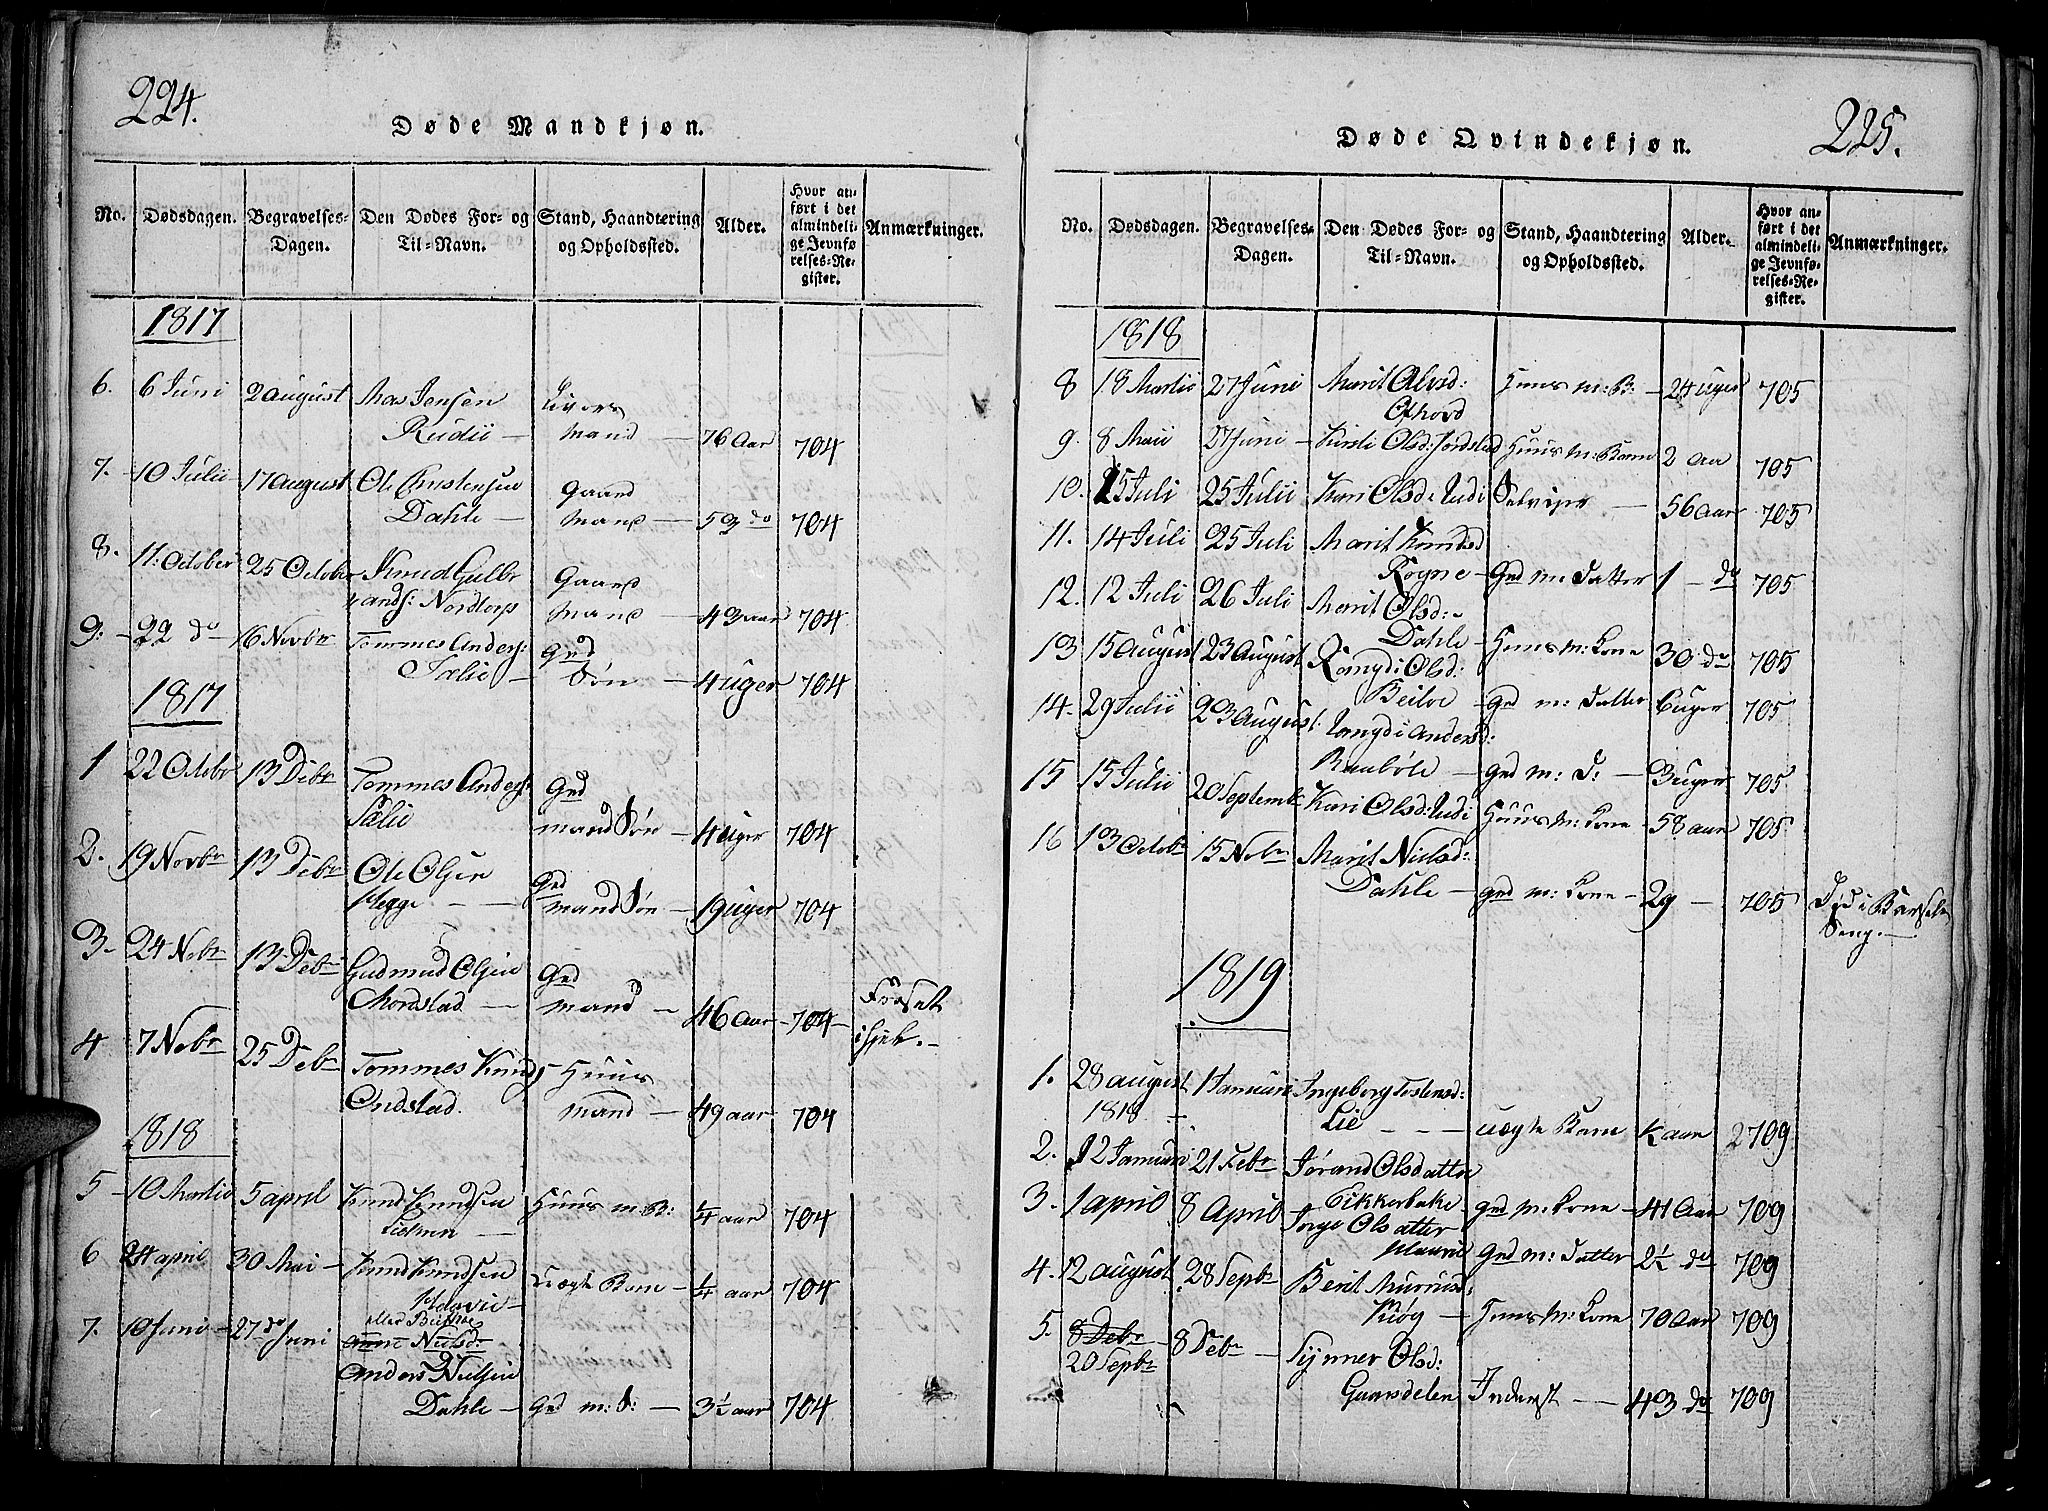 SAH, Slidre prestekontor, Klokkerbok nr. 2, 1814-1839, s. 224-225